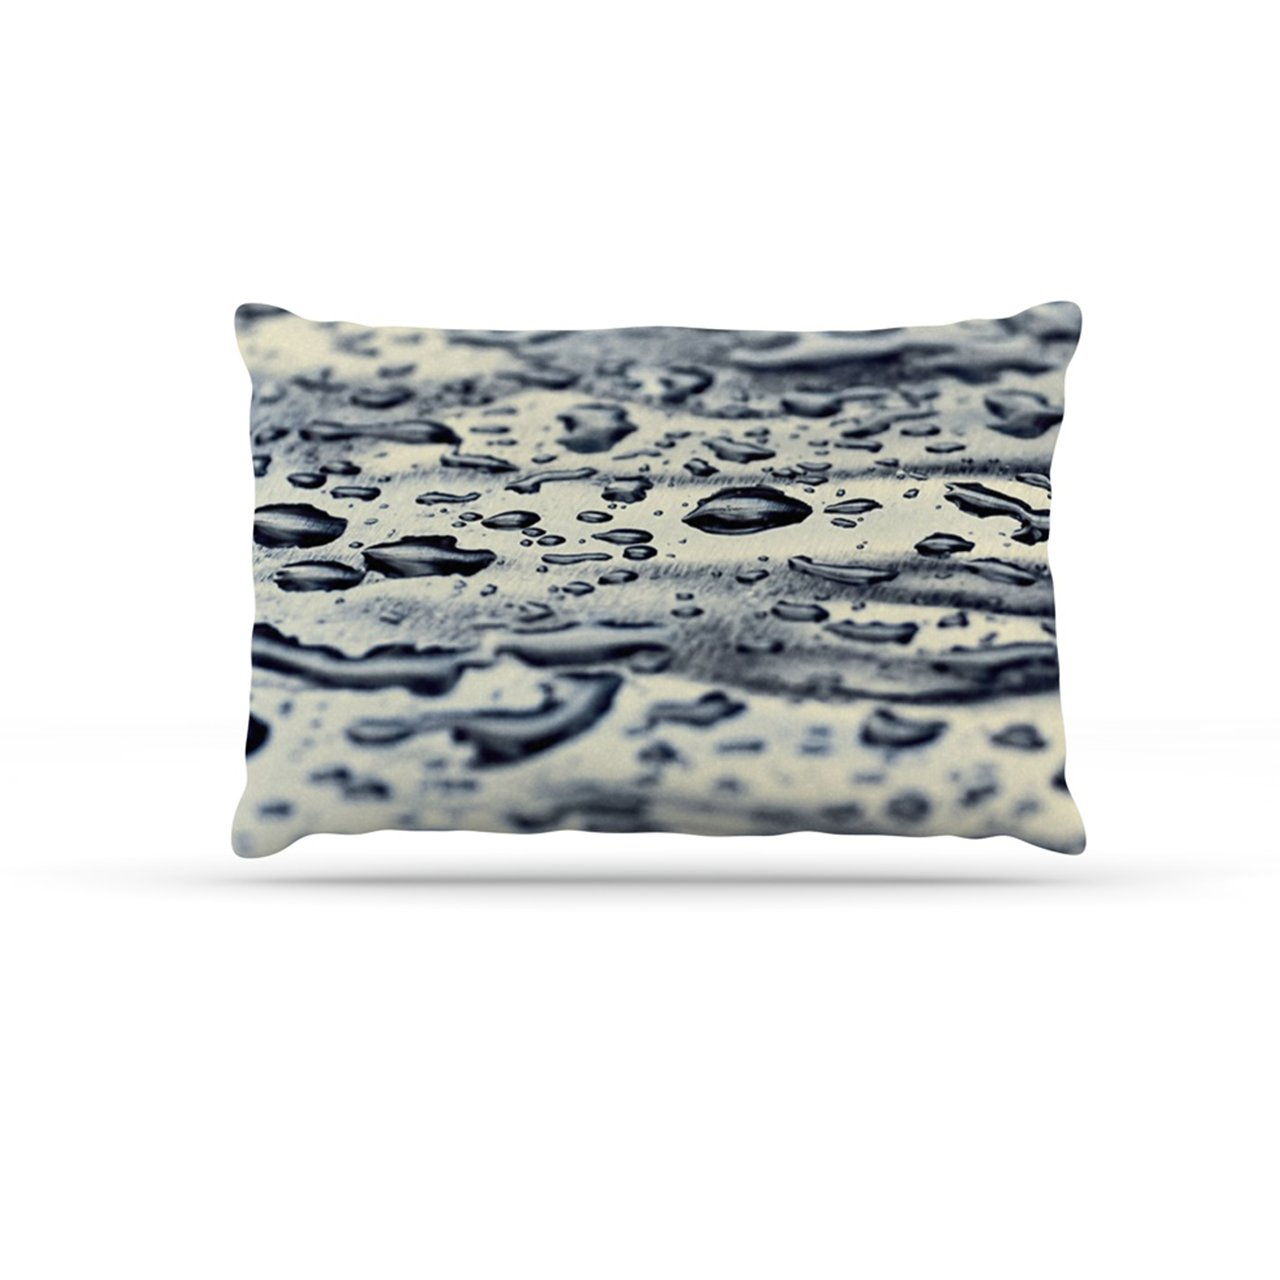 Kess InHouse Ingrid Beddoes bluee Ice  Raindrops Fleece Dog Bed, 30 by 40